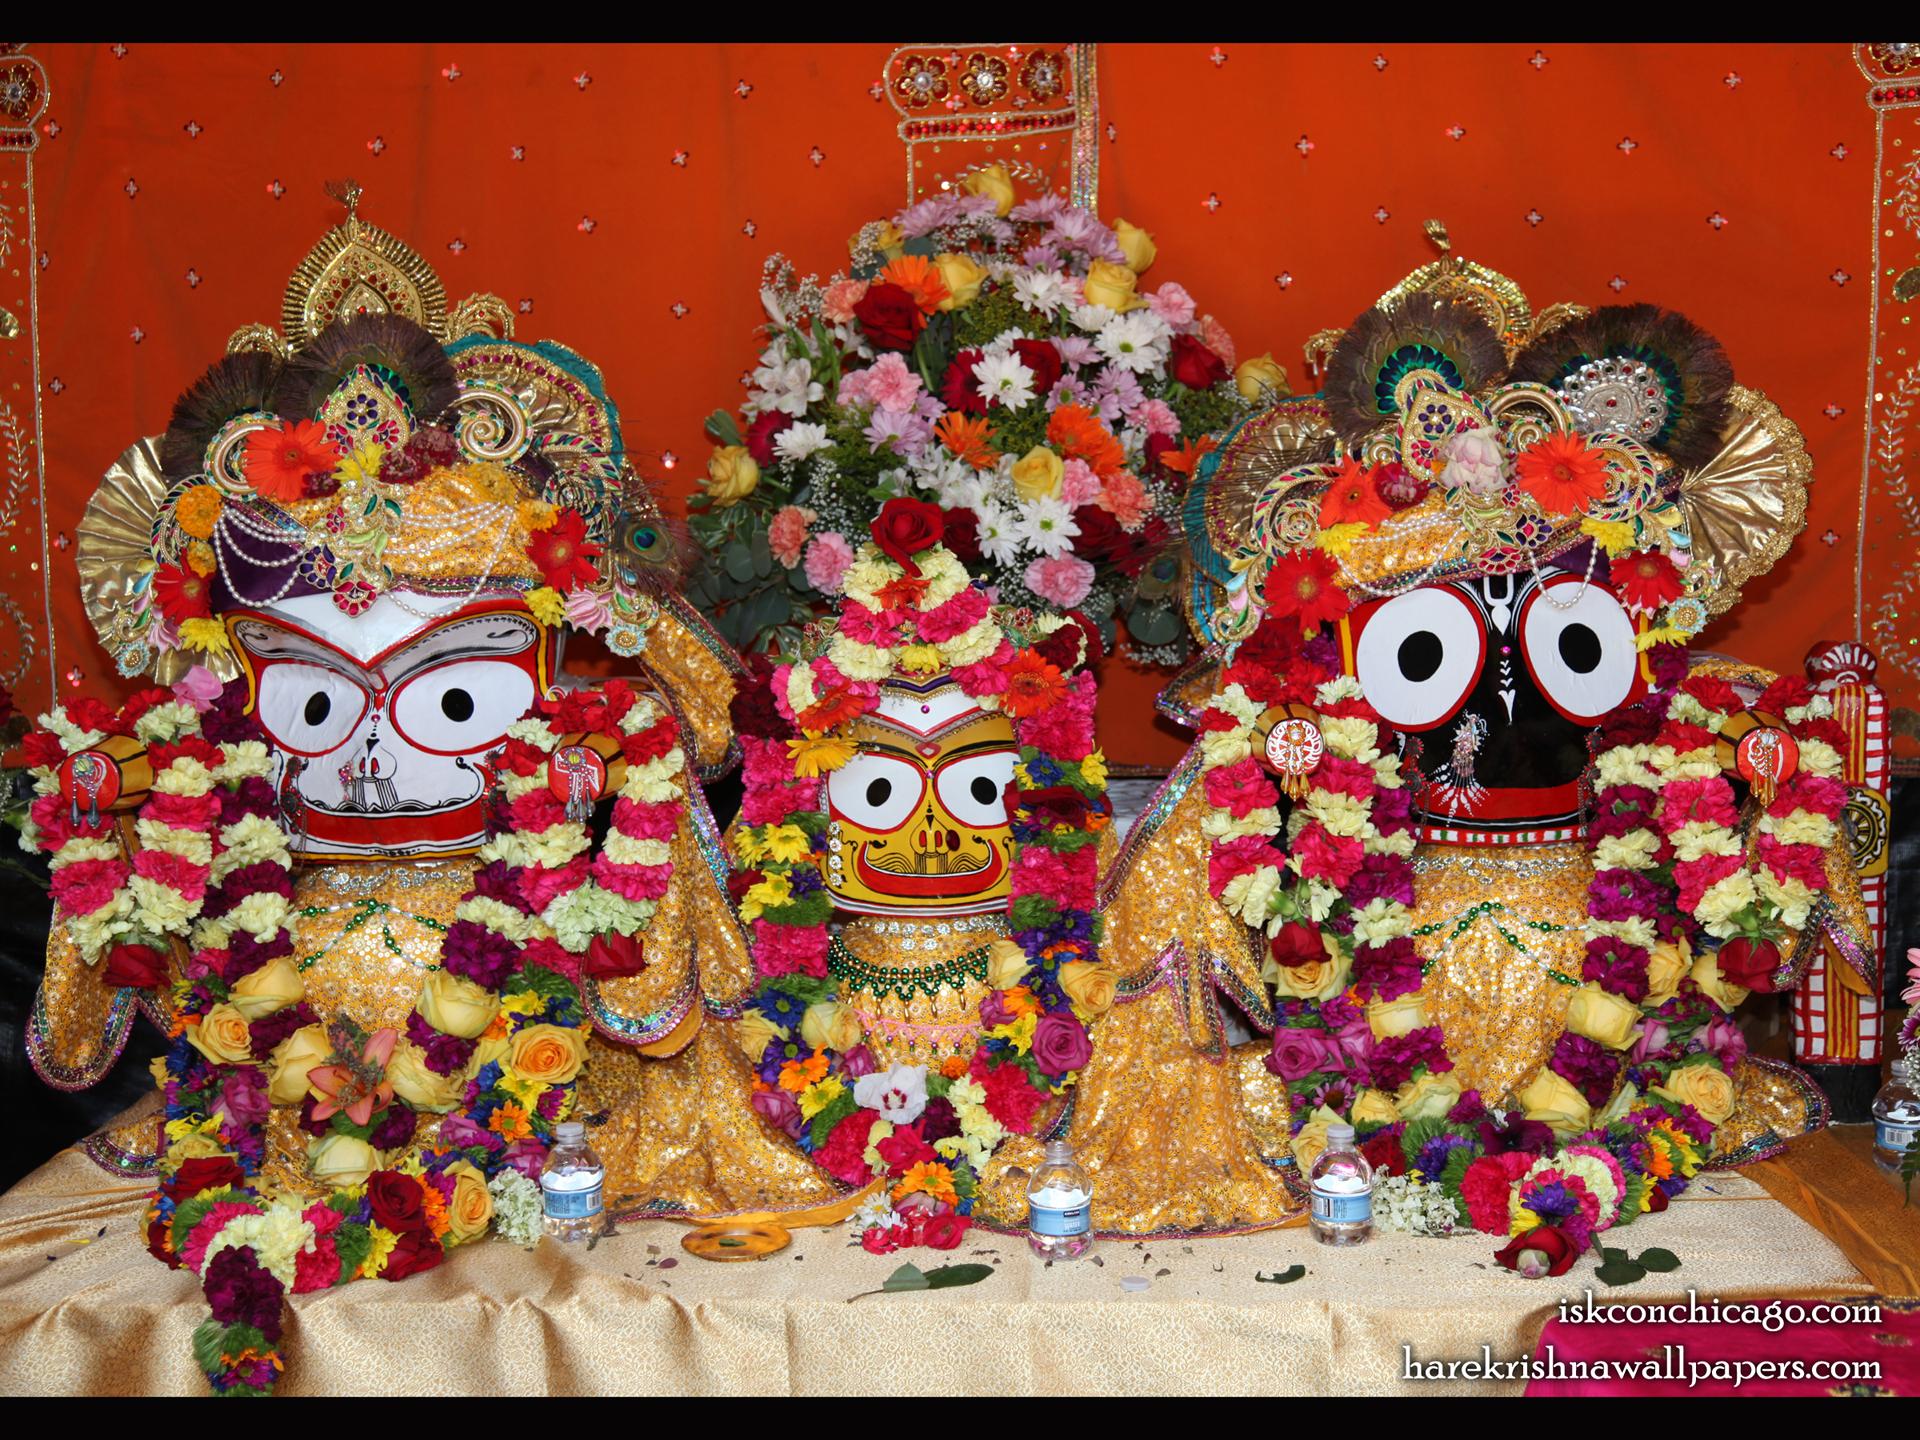 Jagannath Baladeva Subhadra Wallpaper (002) Size 1920x1440 Download